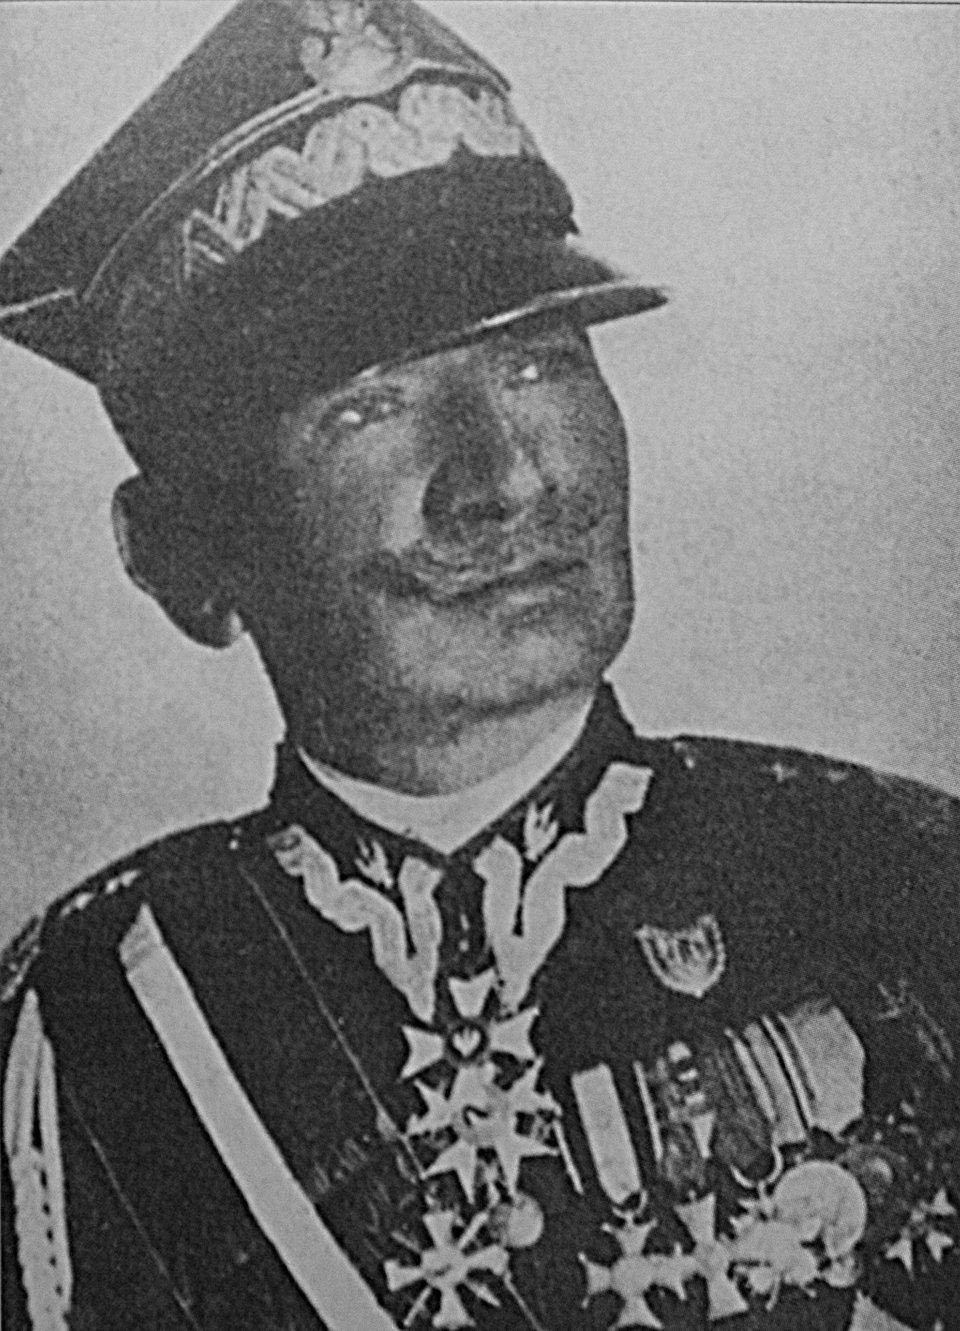 Gen. Juliusz Rómmel Gen. Juliusz Rómmel Źródło: domena publiczna.